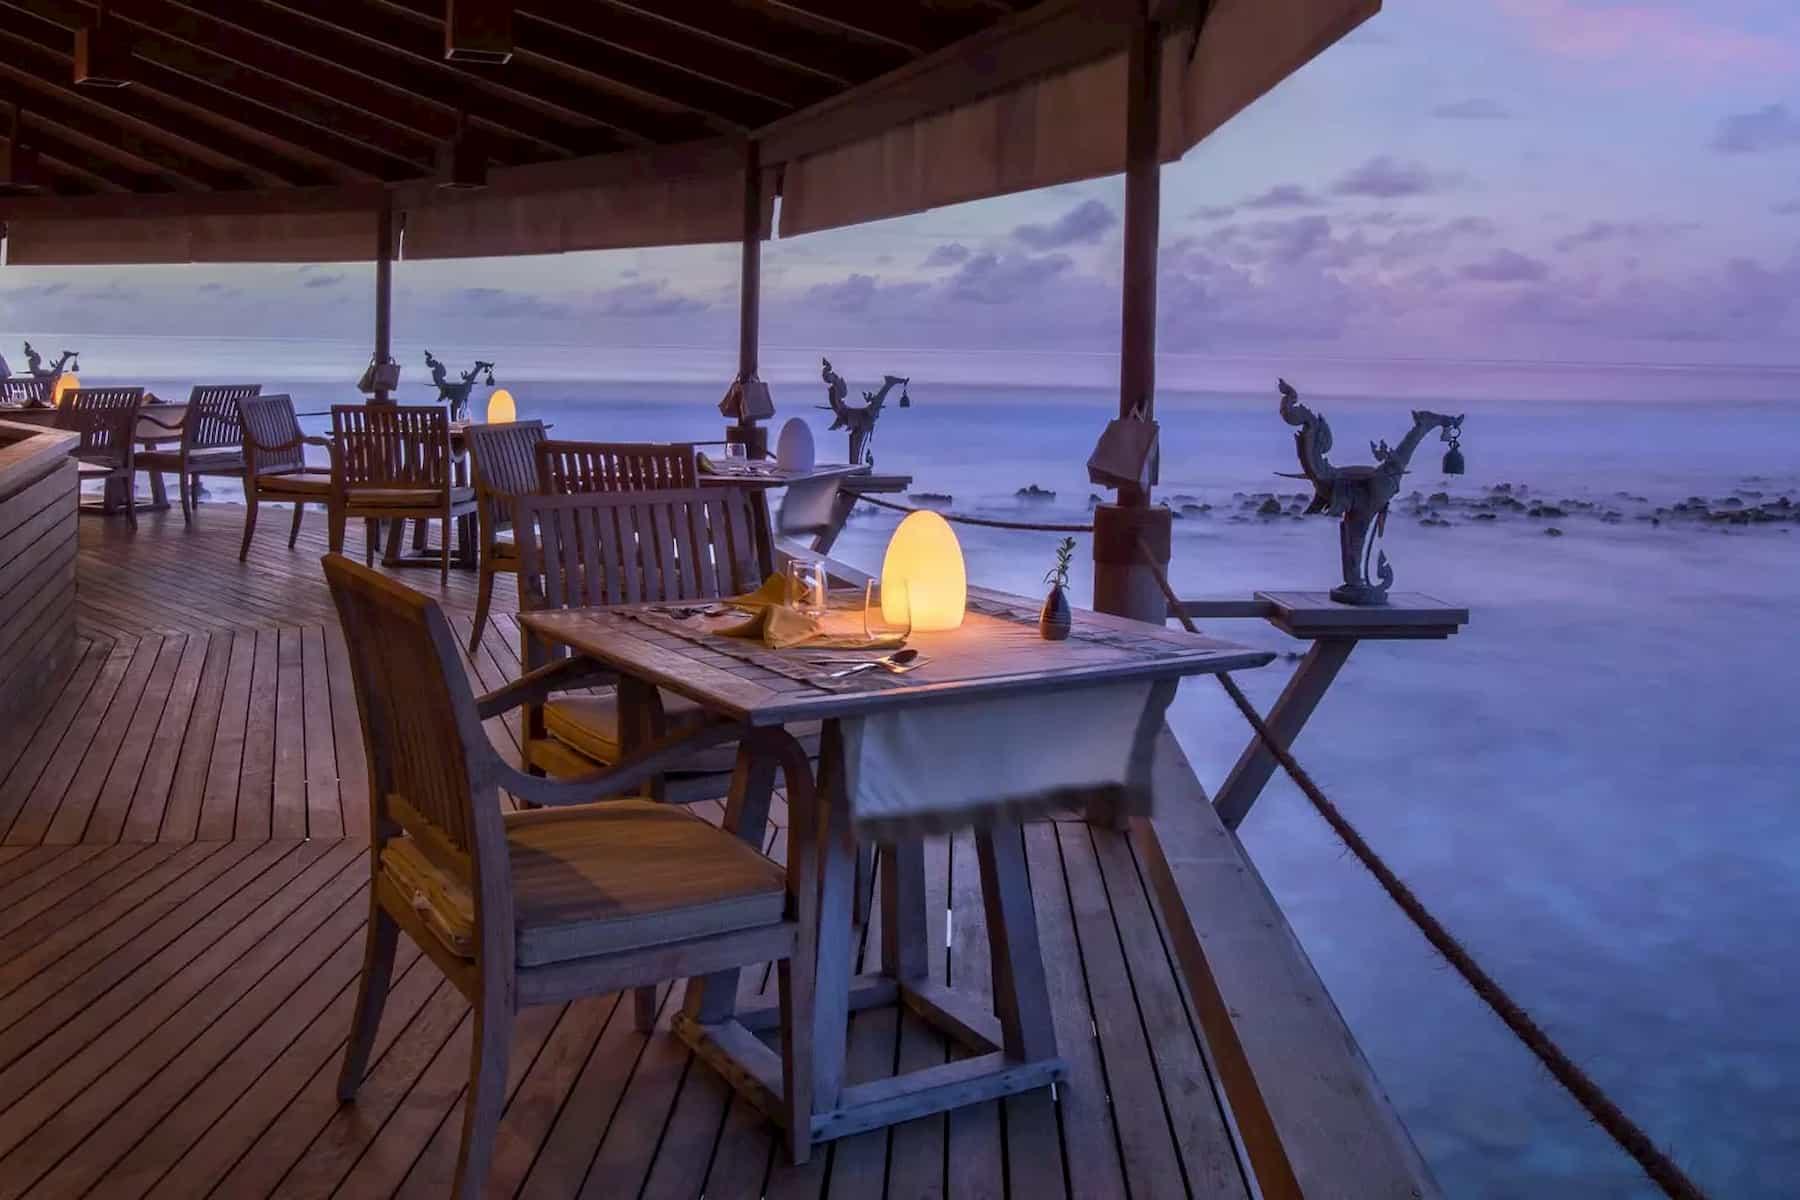 Anantara Dhigu resort Maldive ristorante Baan Huraa cucina thailandese